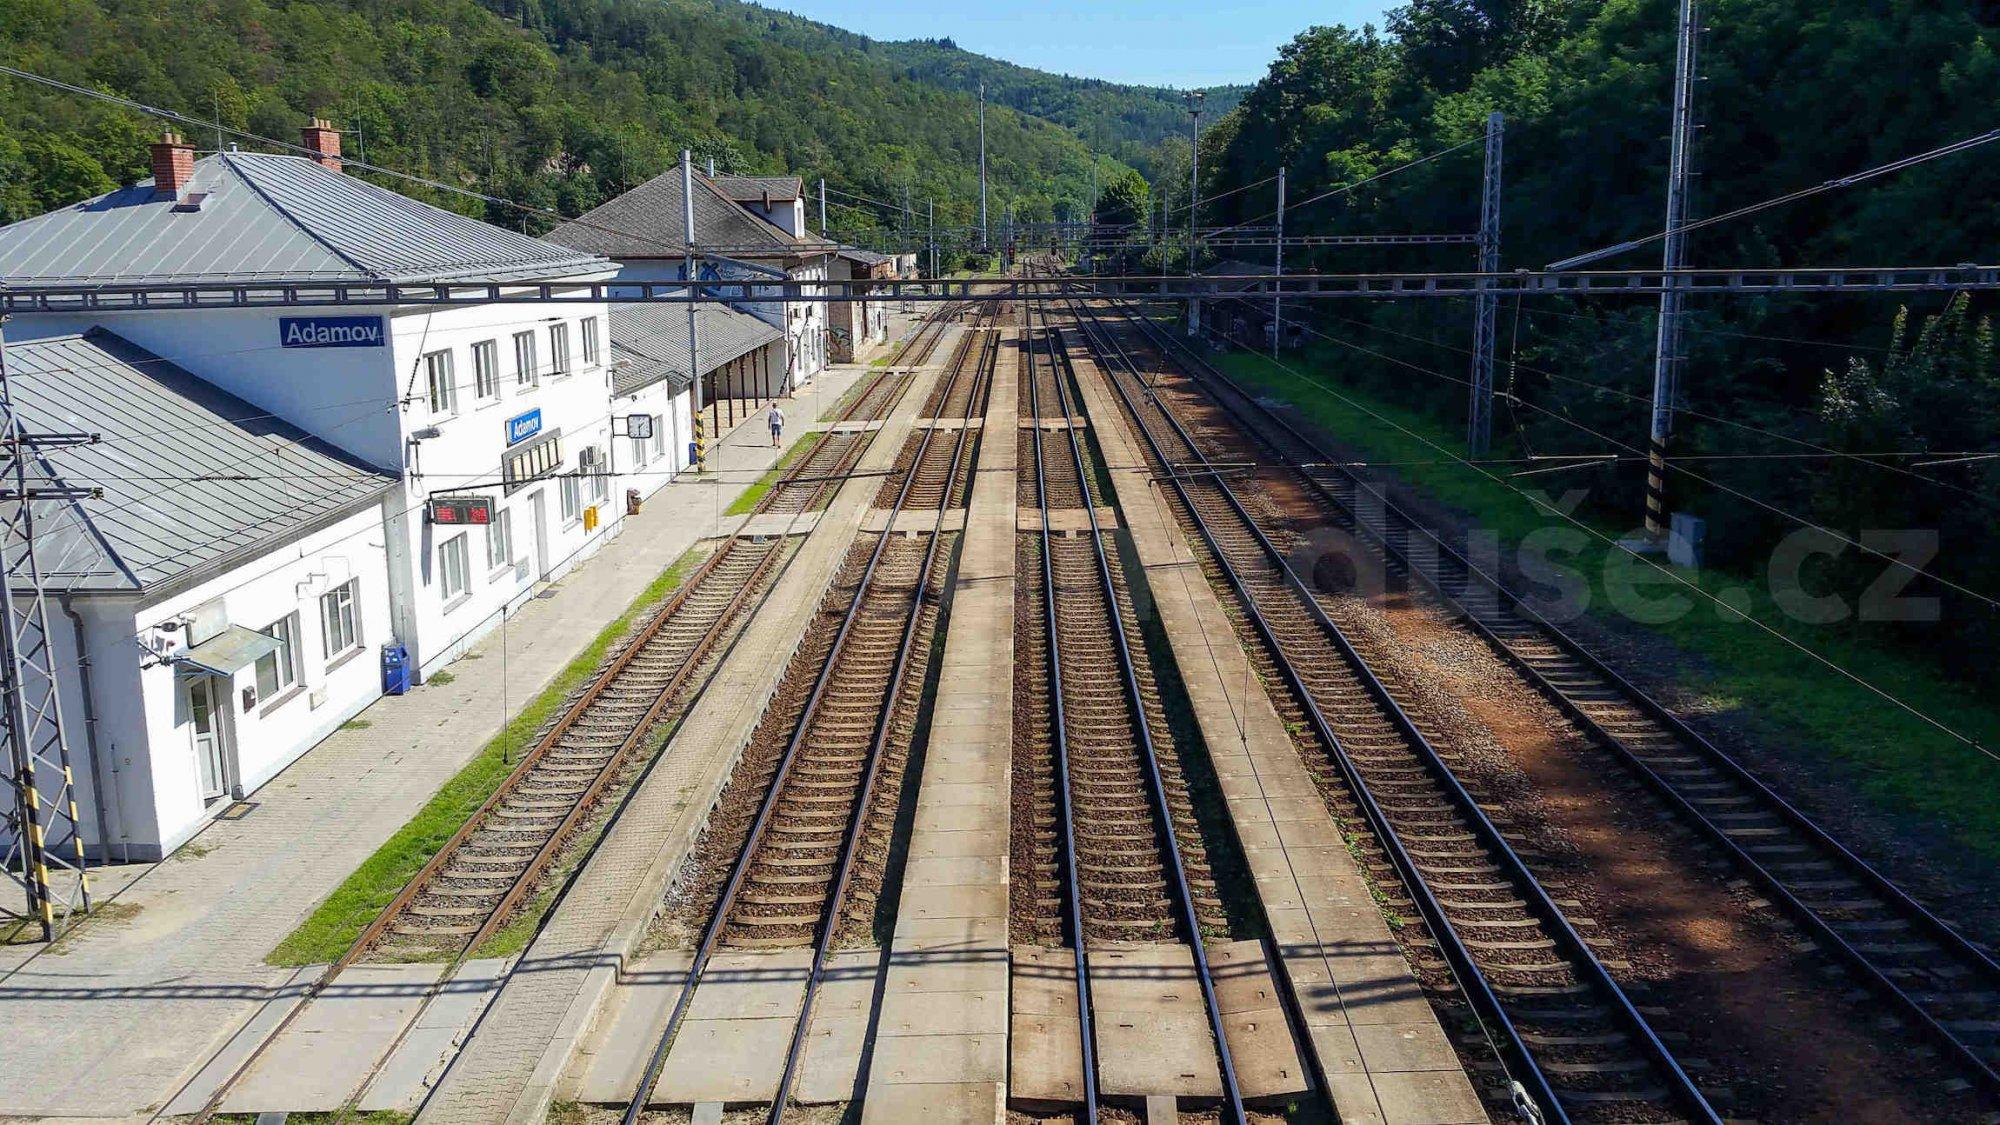 Train station Adamov